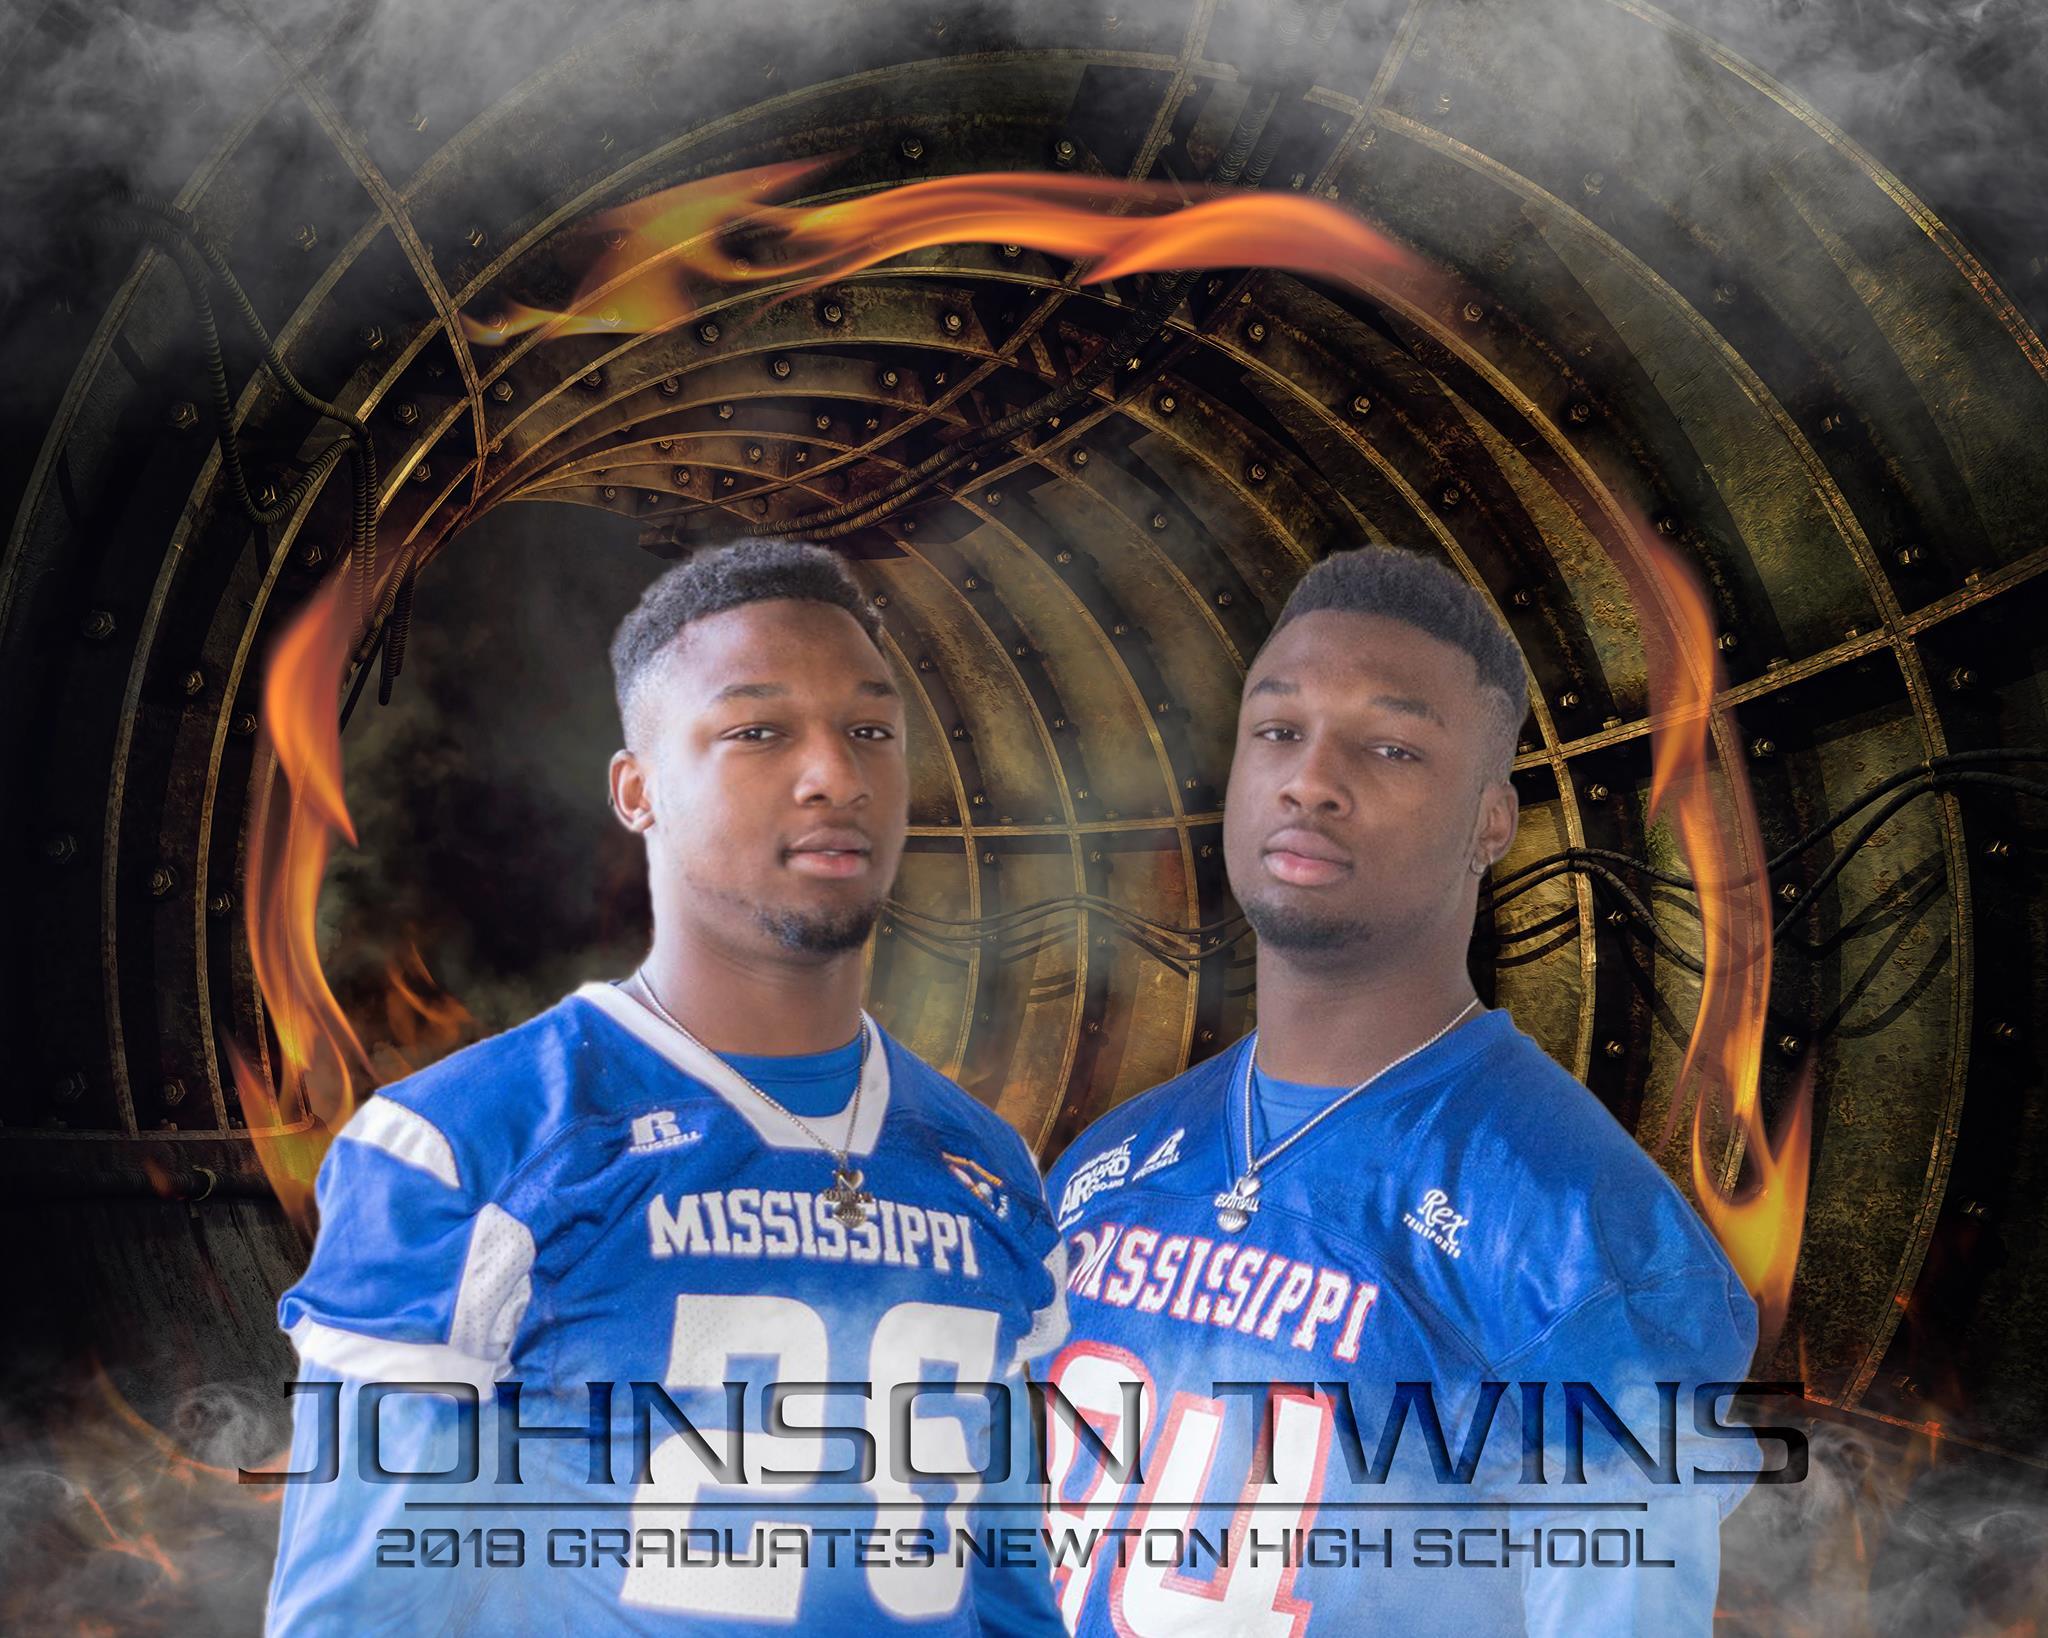 Johnson Twins